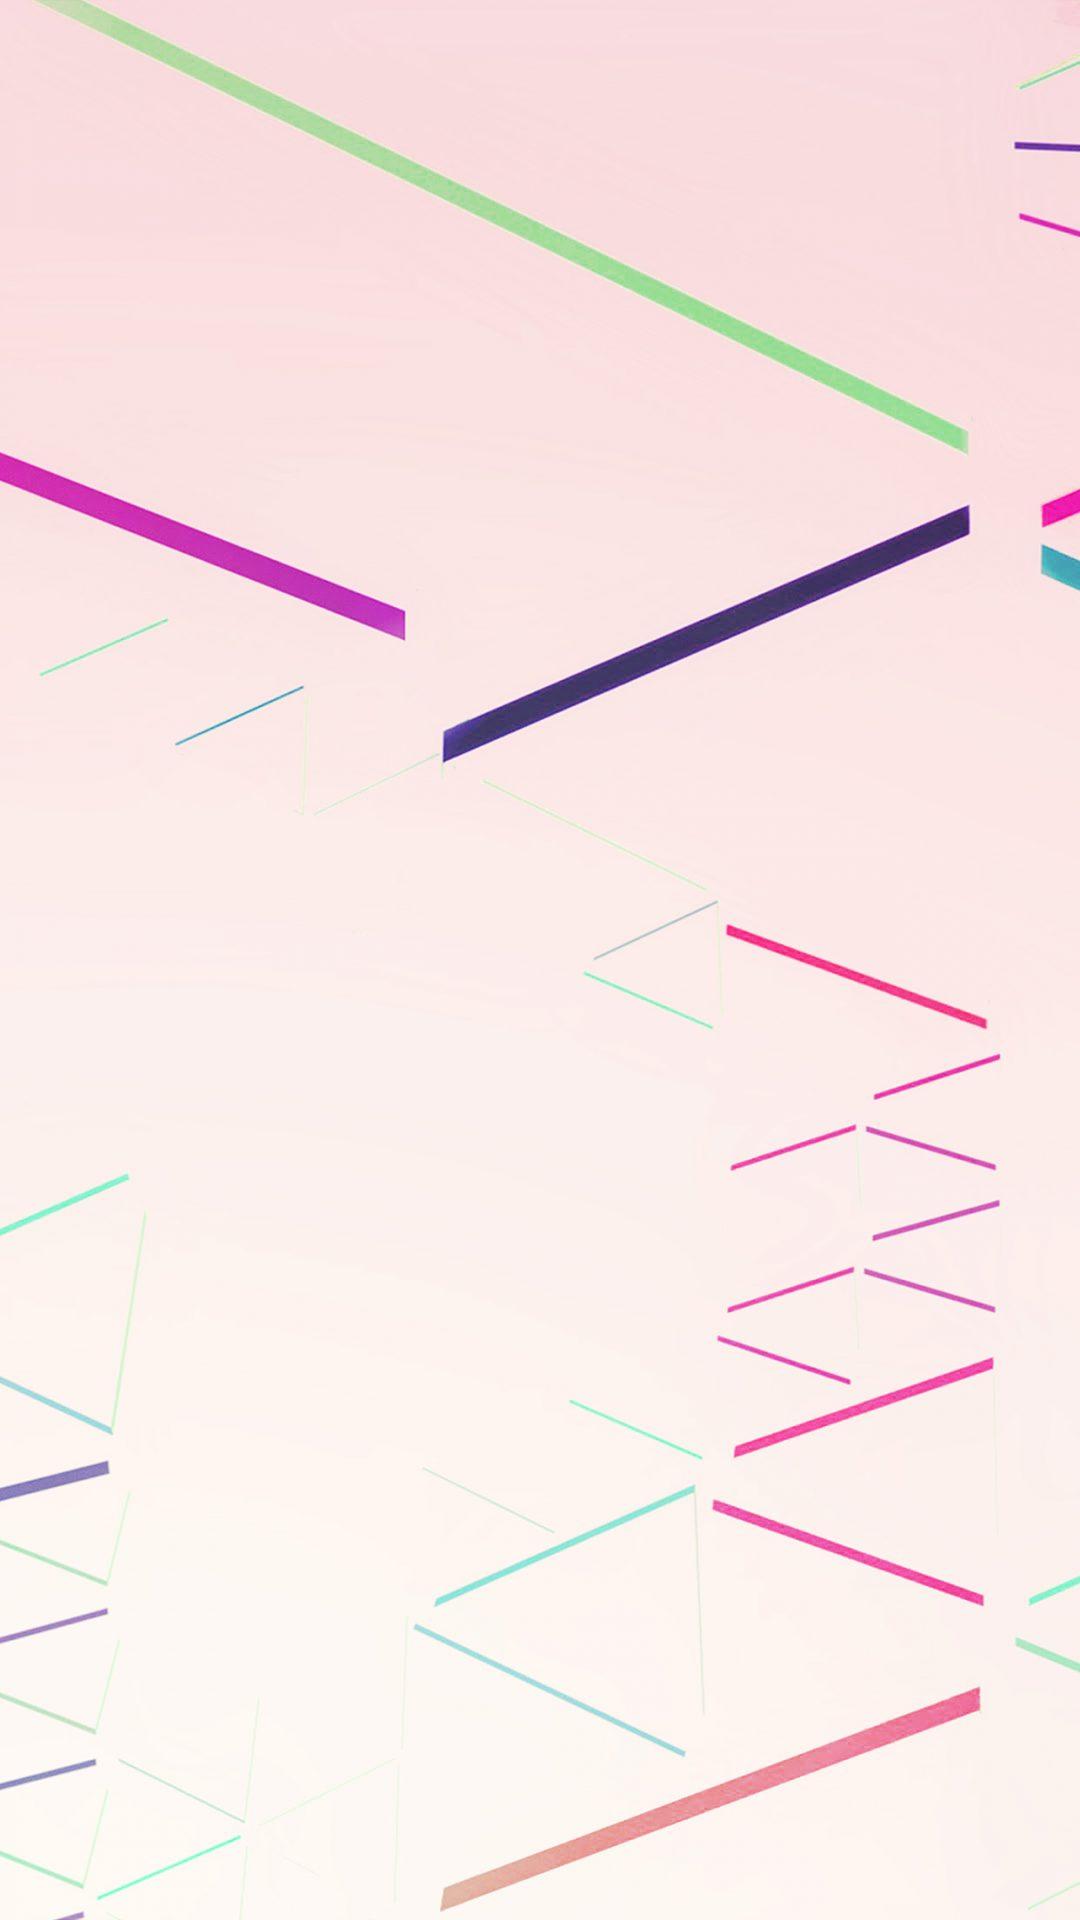 Nexus 7 Abstract Line Rainbow Pink Pattern